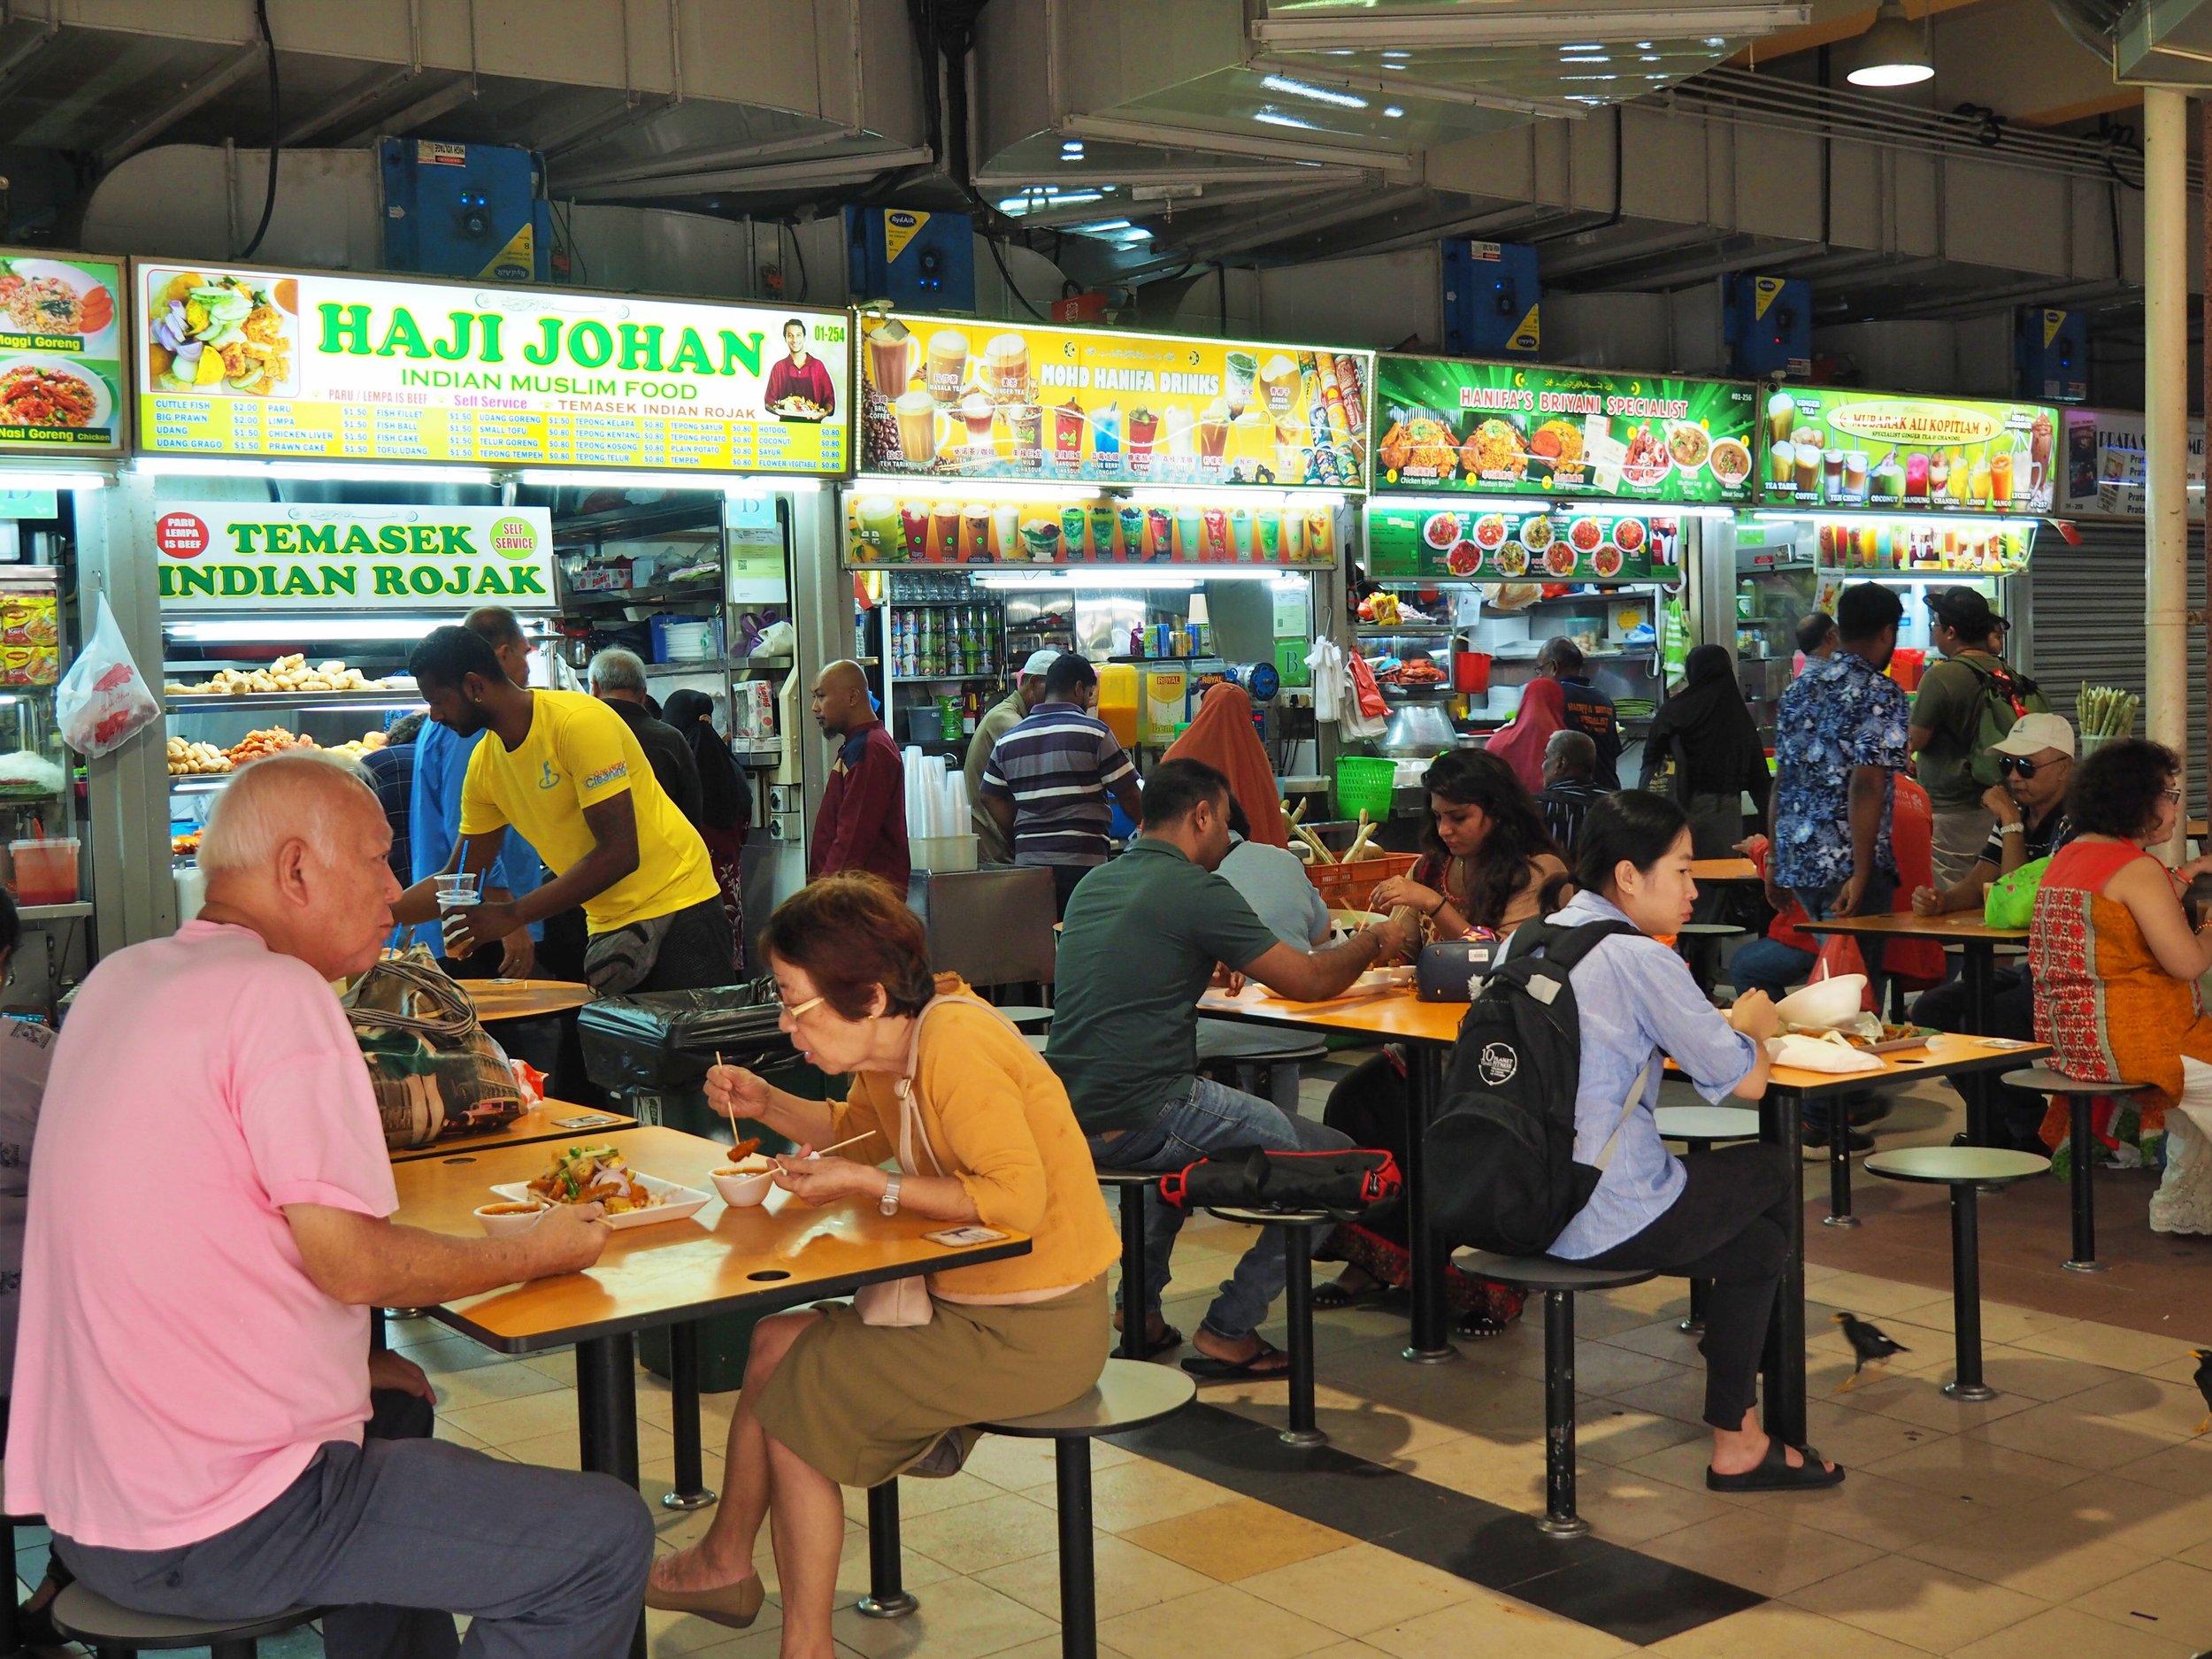 Hawker centre singapore.jpg